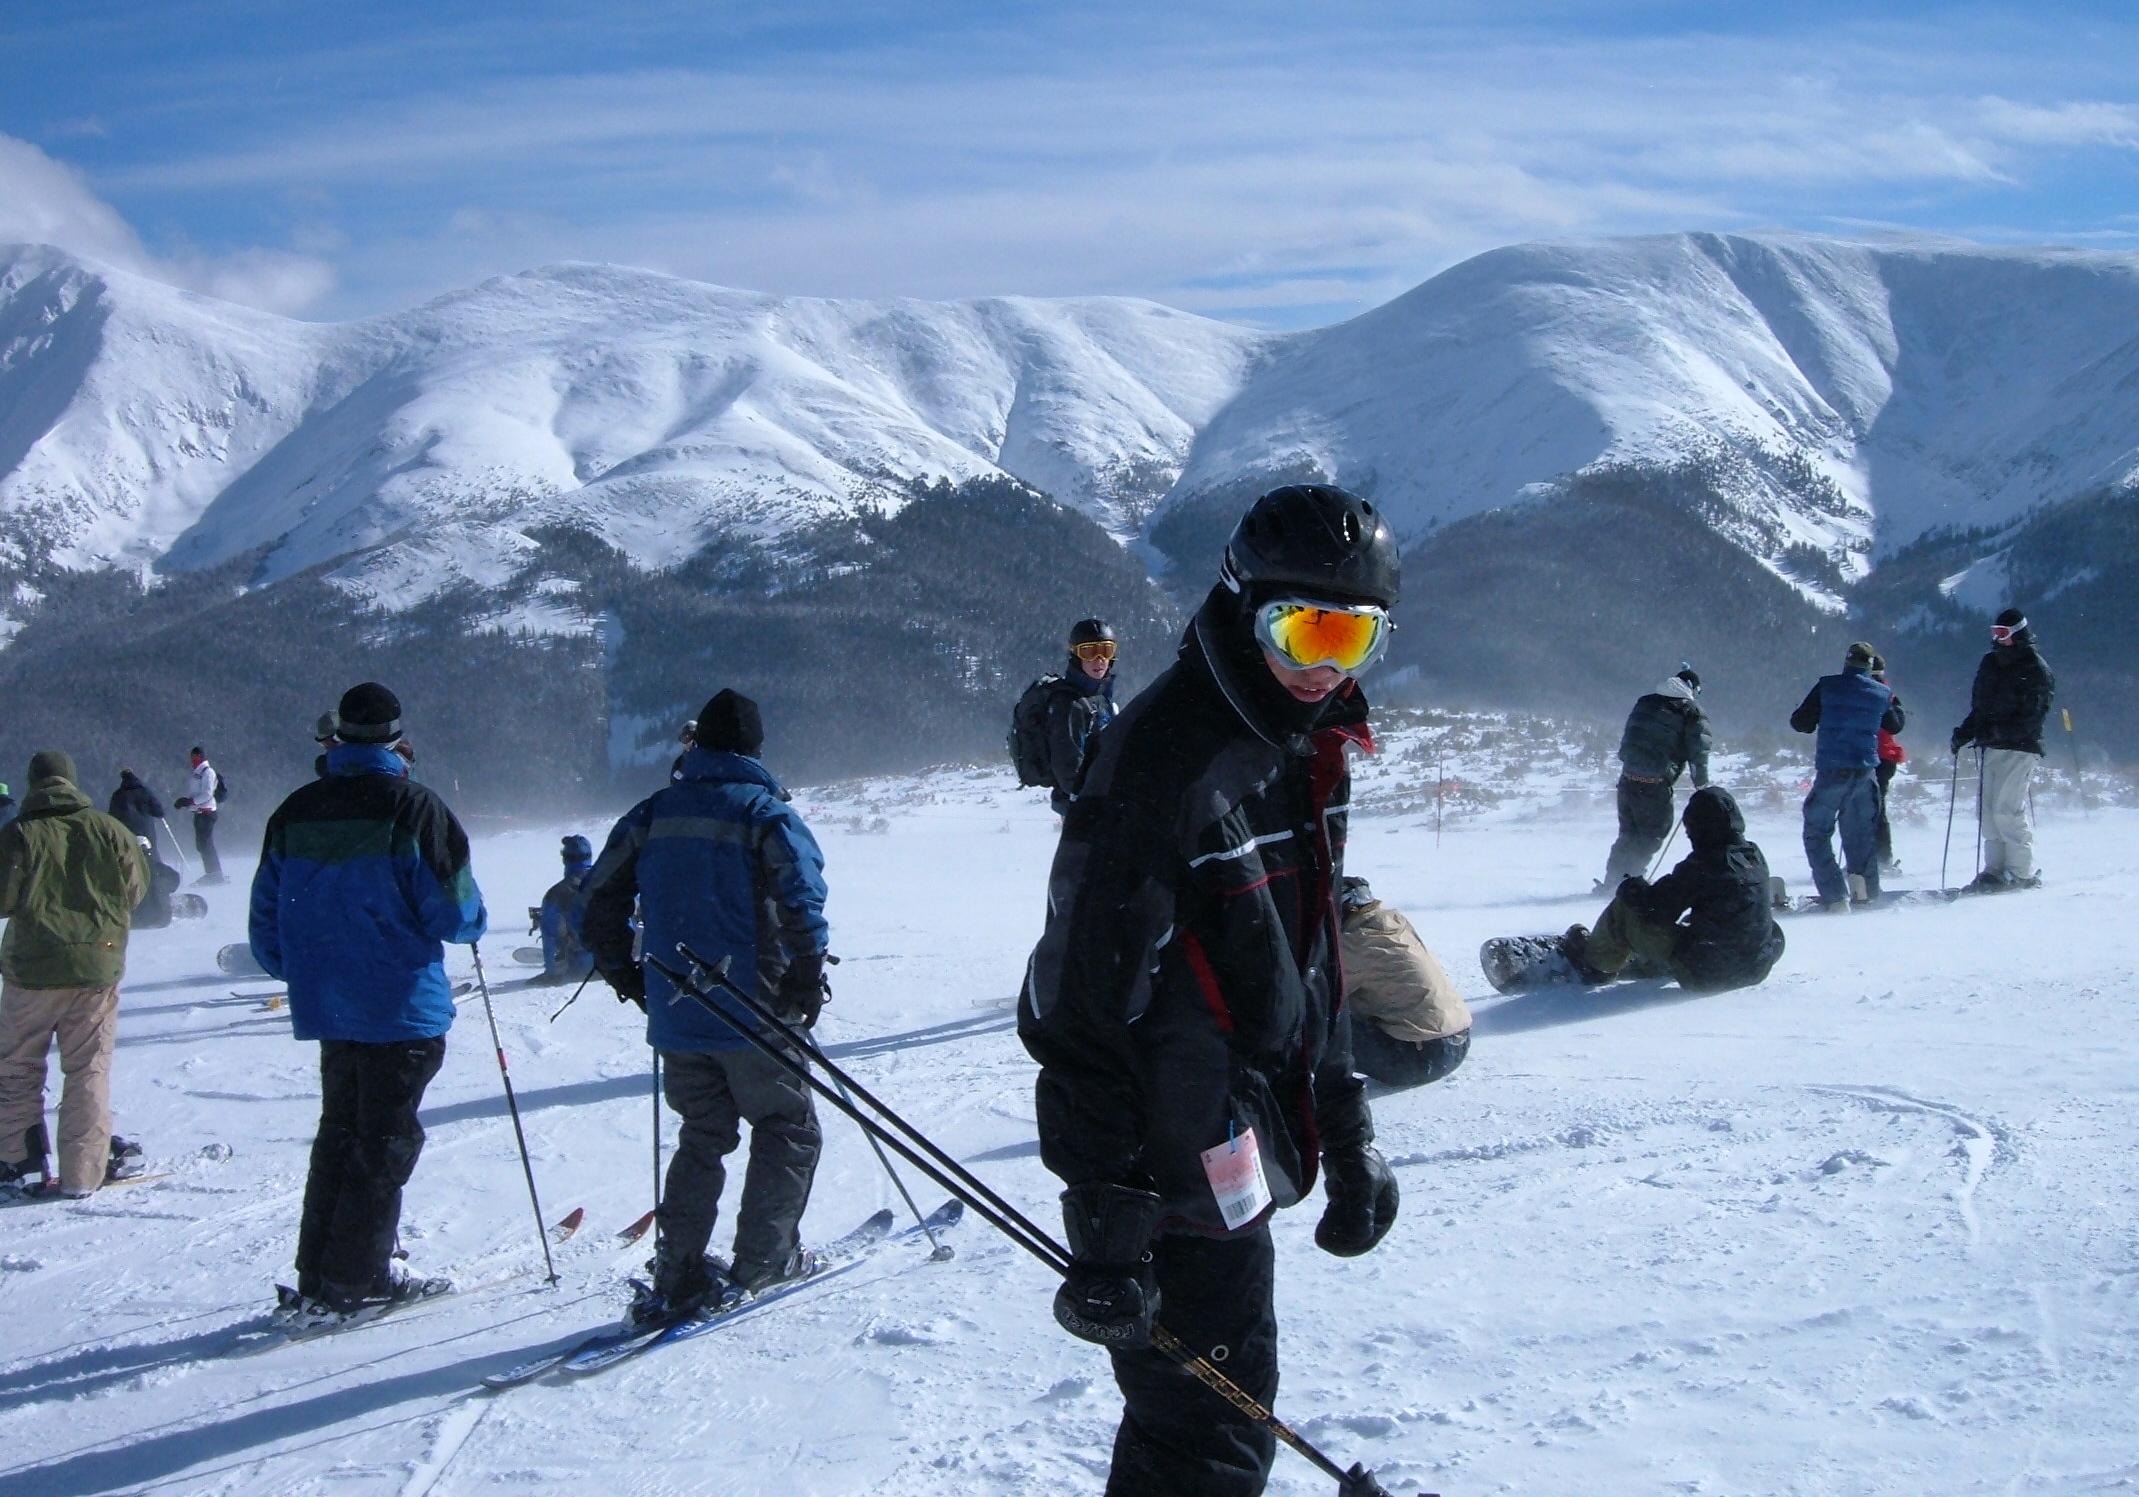 snowboarding , skiing, apine skiing